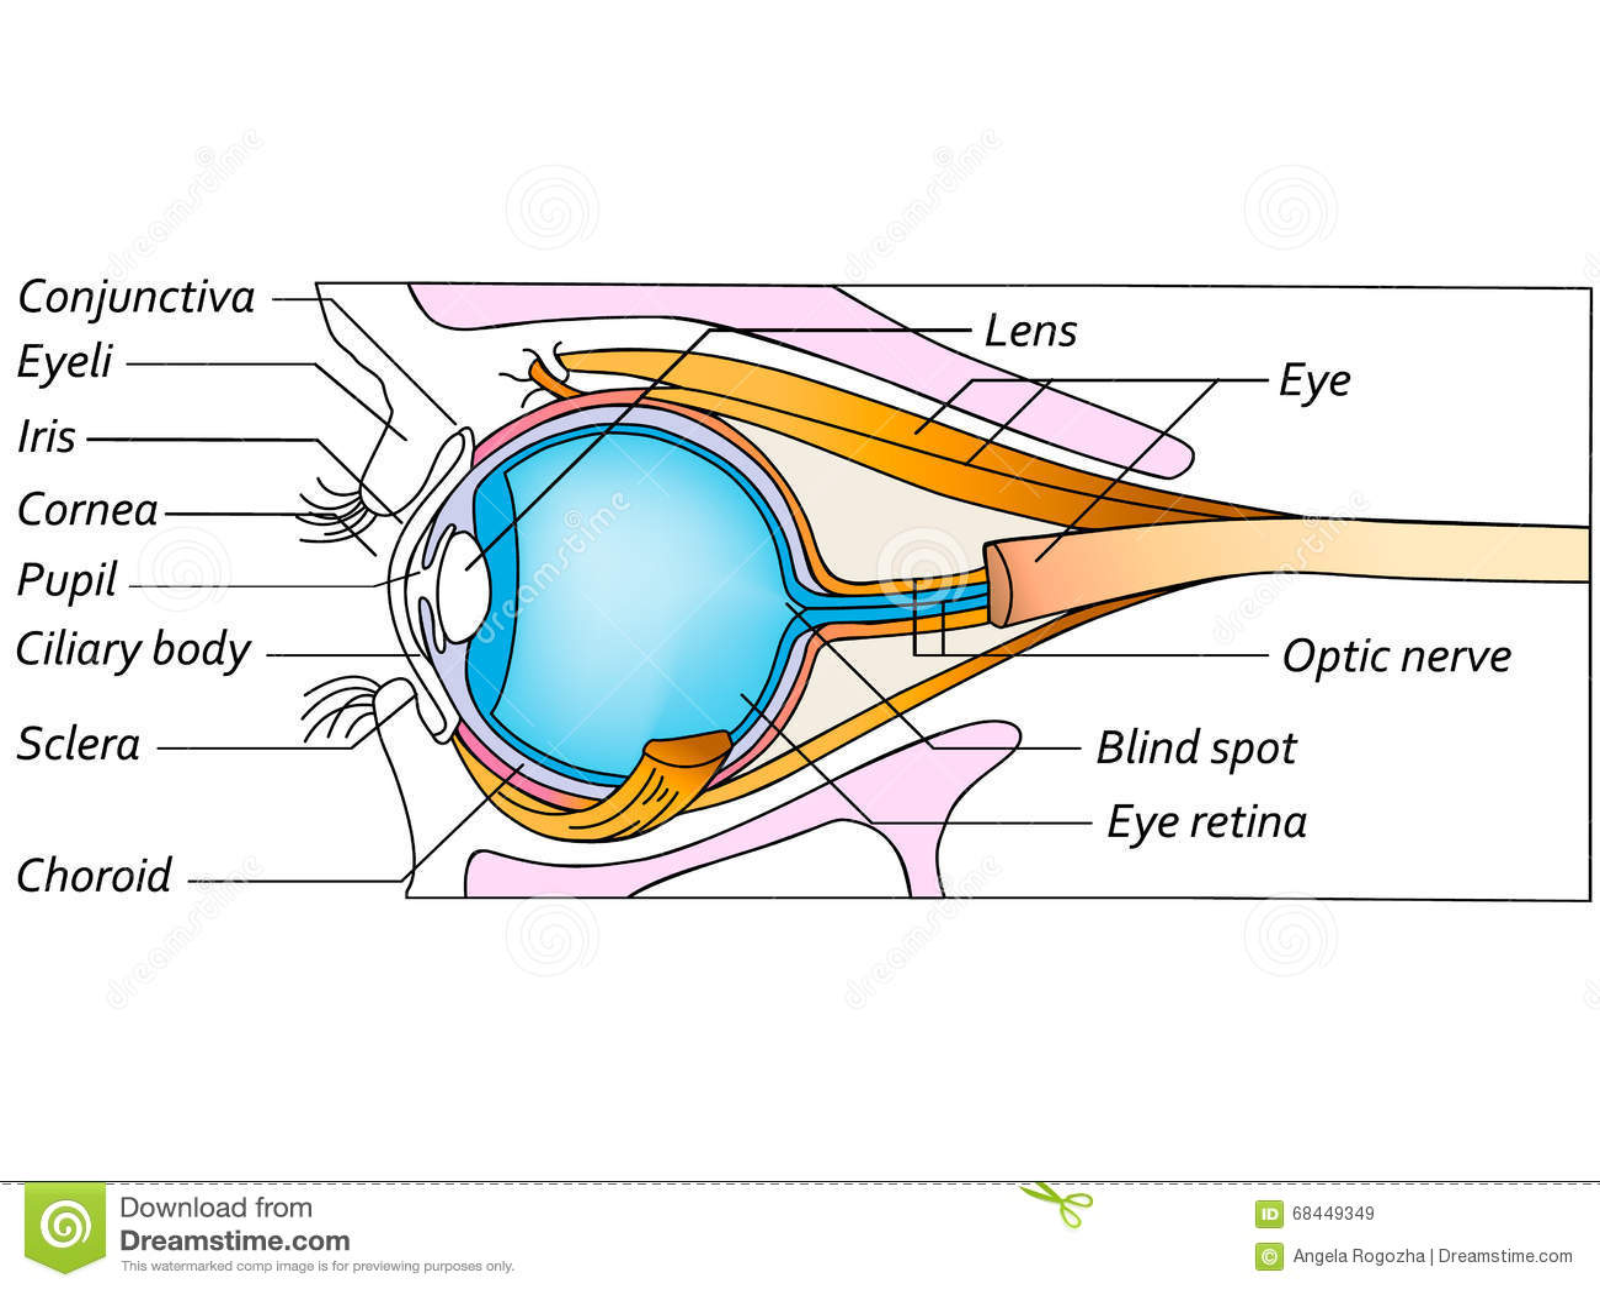 Anatomy Of The Eye, Detailed Illustration Stock Illustration ...